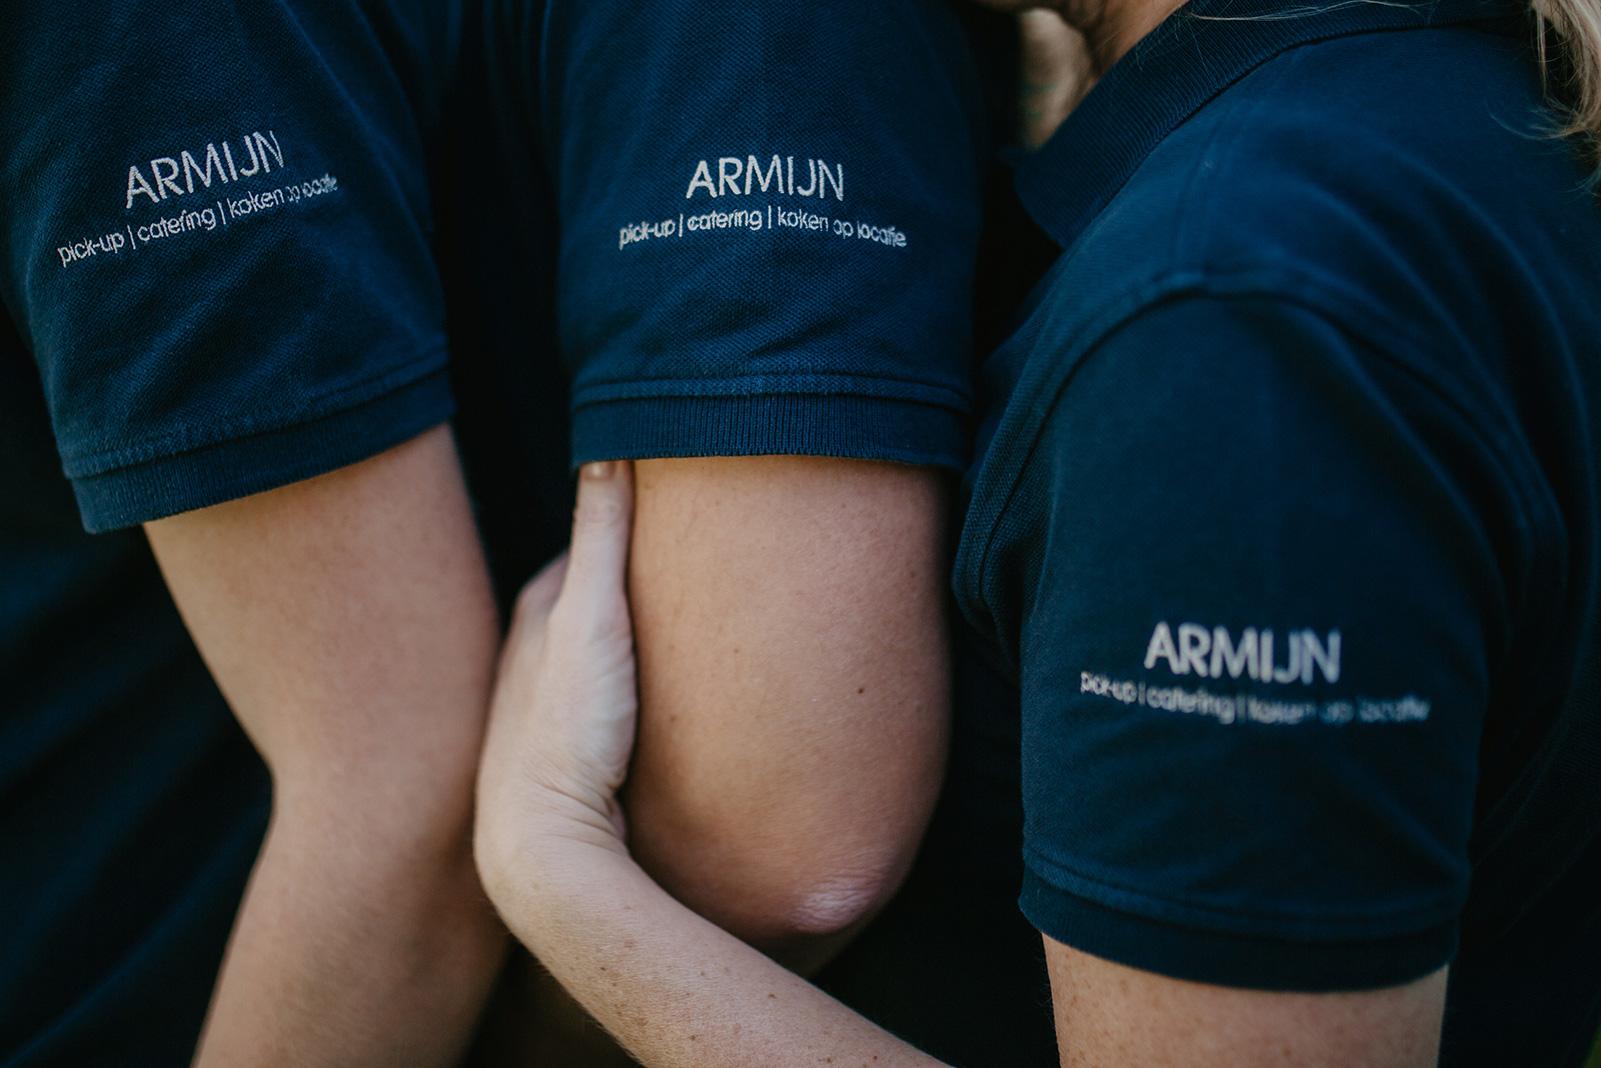 ARMIJN team